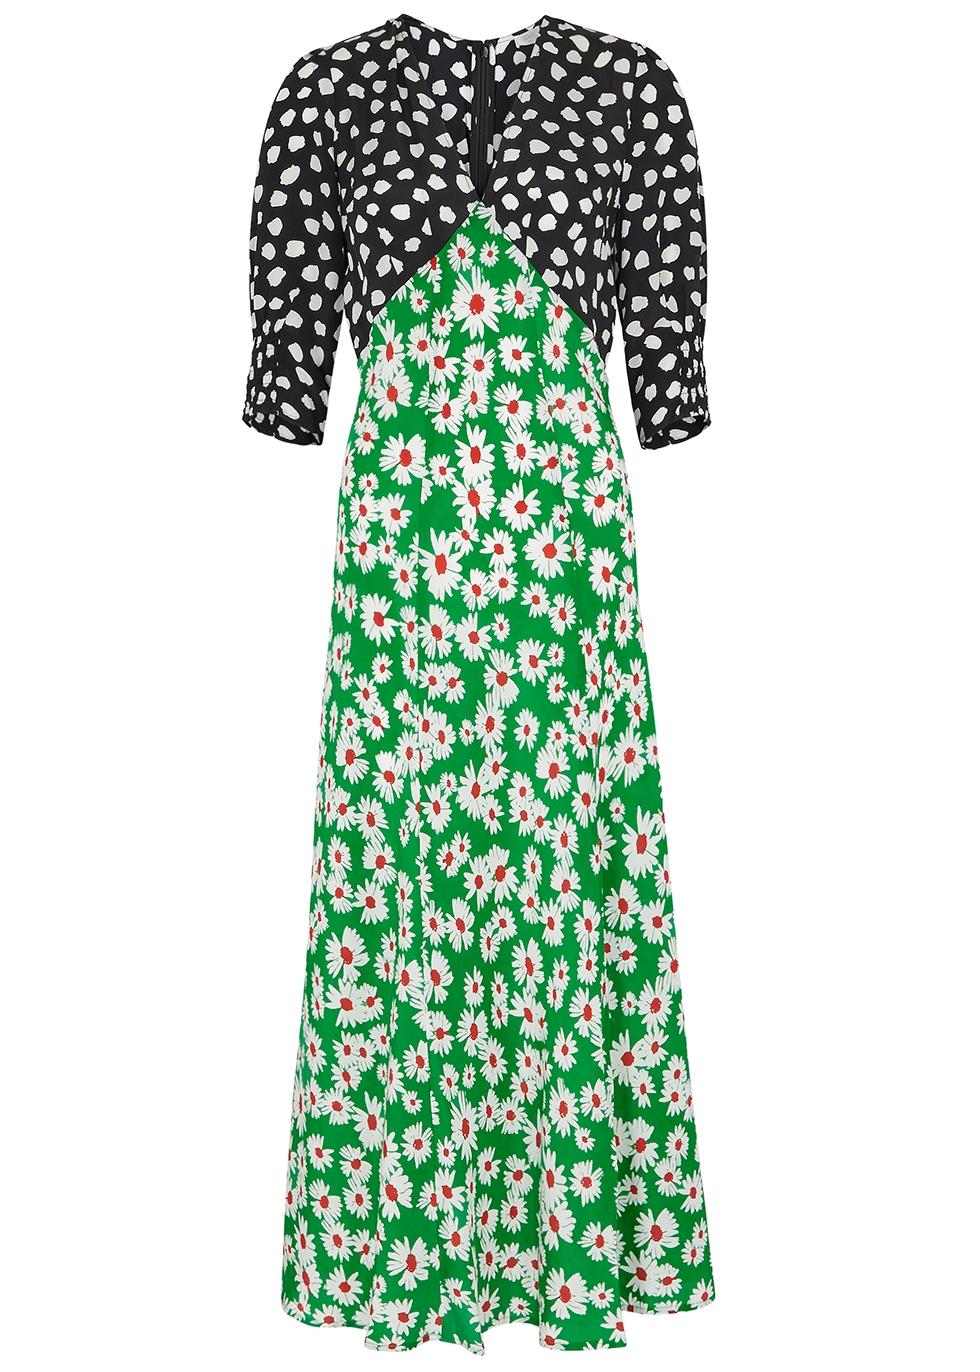 8efdfeb99e0 Designer Dresses   Designer Gowns - Harvey Nichols